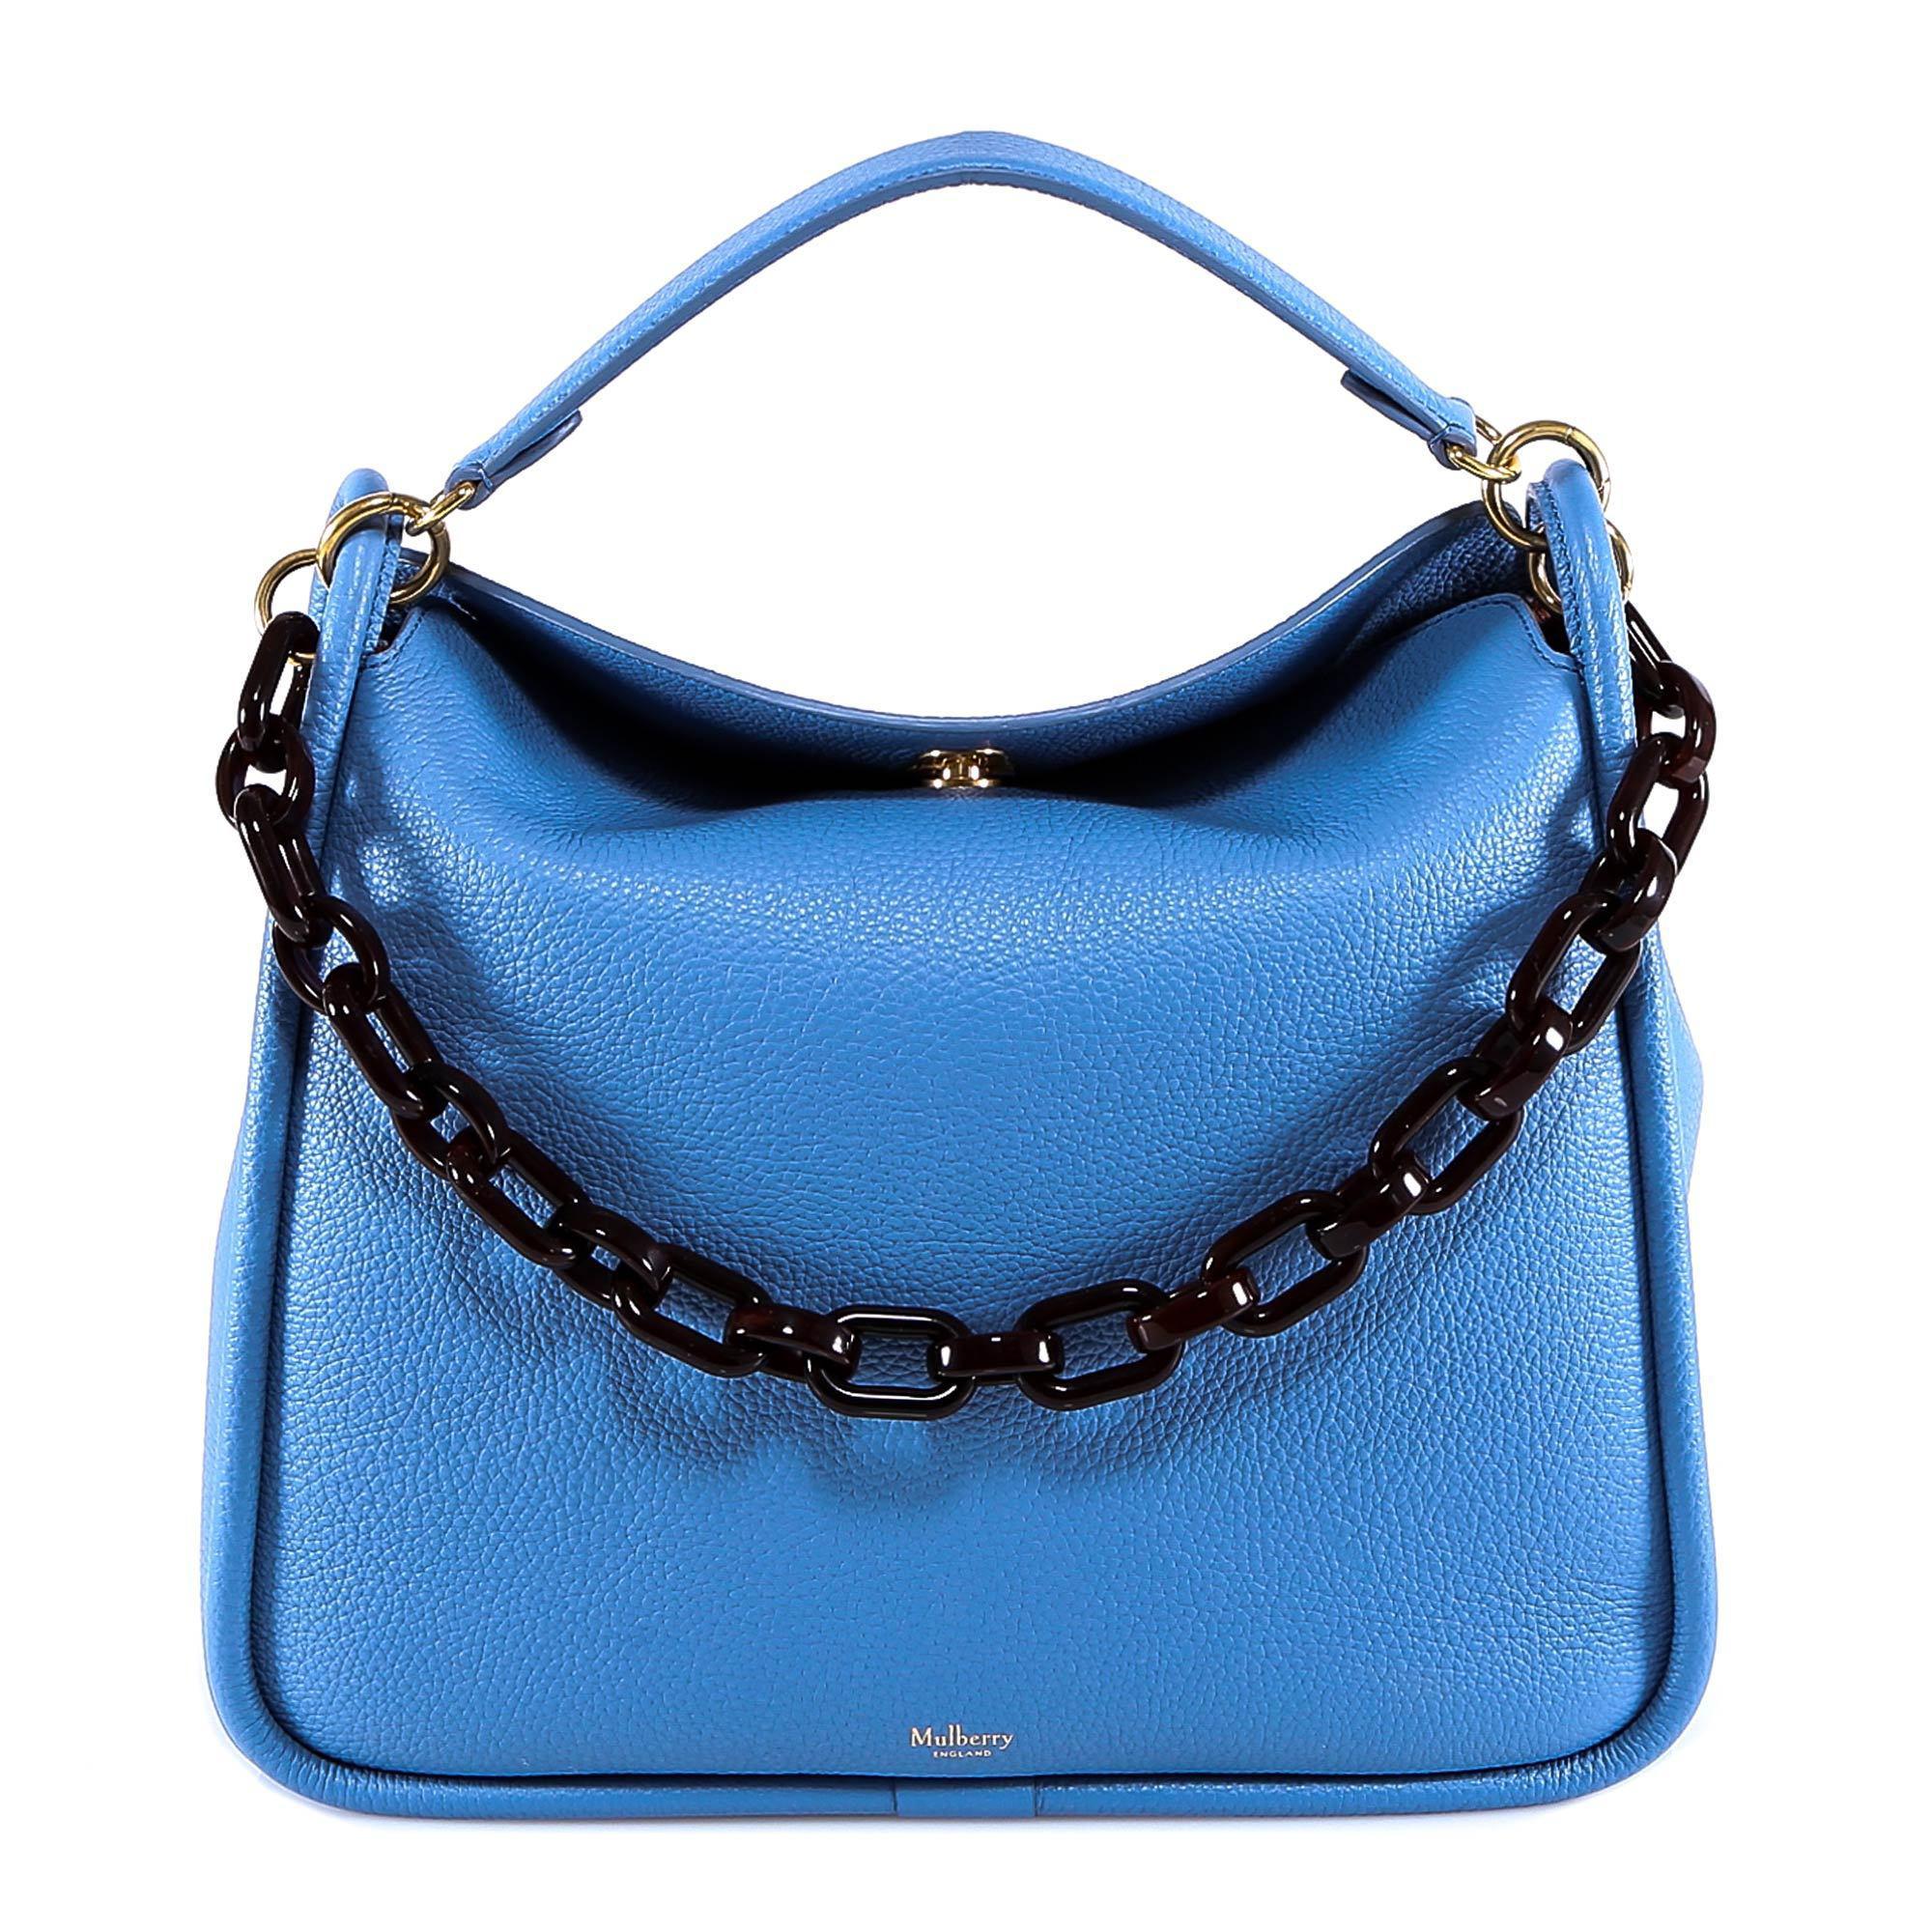 ... promo code for mulberry blue leighton shoulder bag lyst. view  fullscreen fd58f 0b2a7 d14bd2bec9989